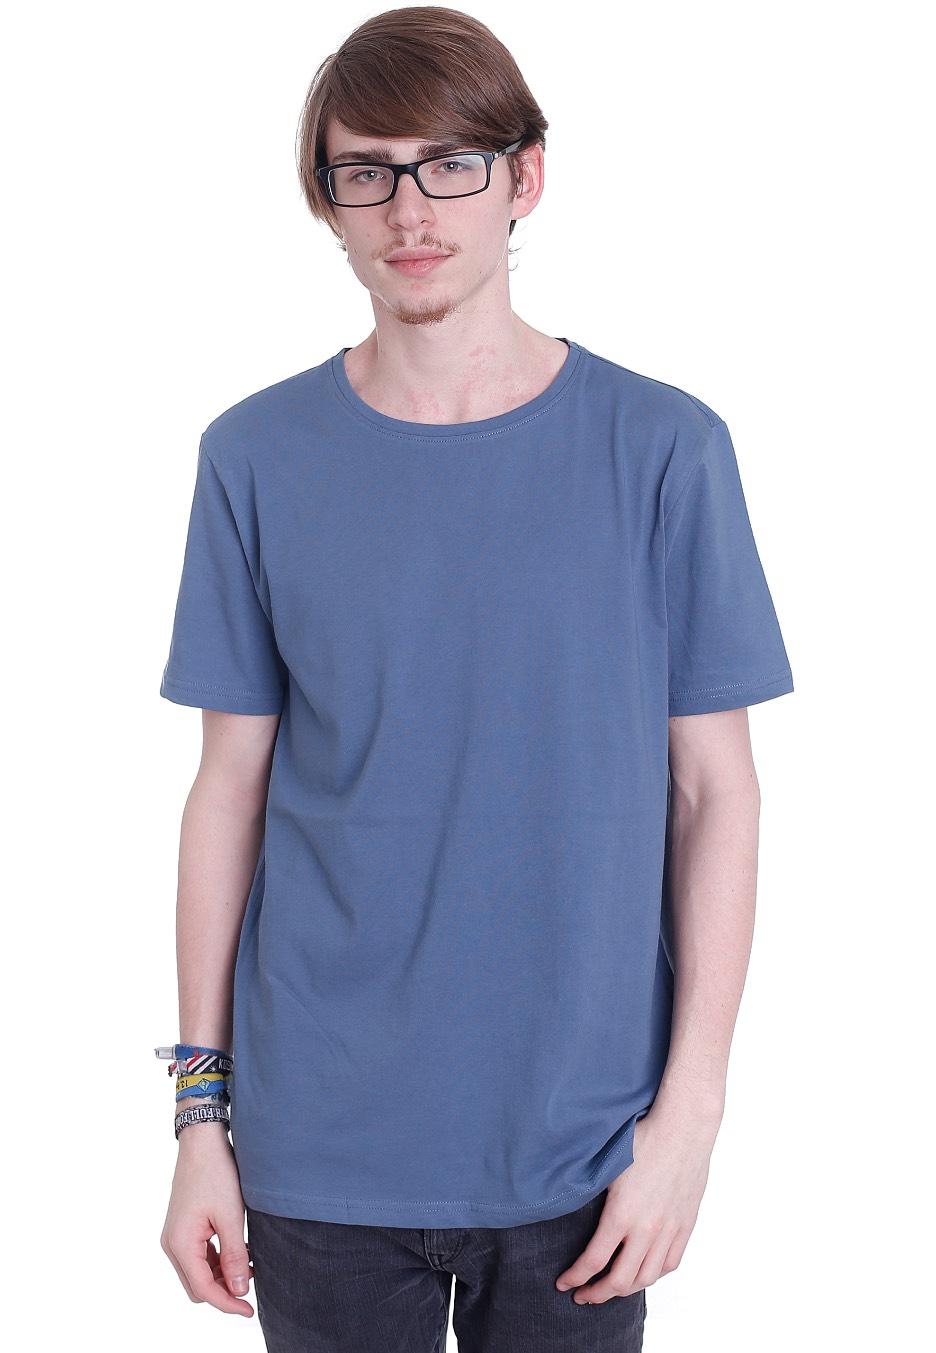 Dr. Denim - Patrick Bad News Blue - - T-Shirts